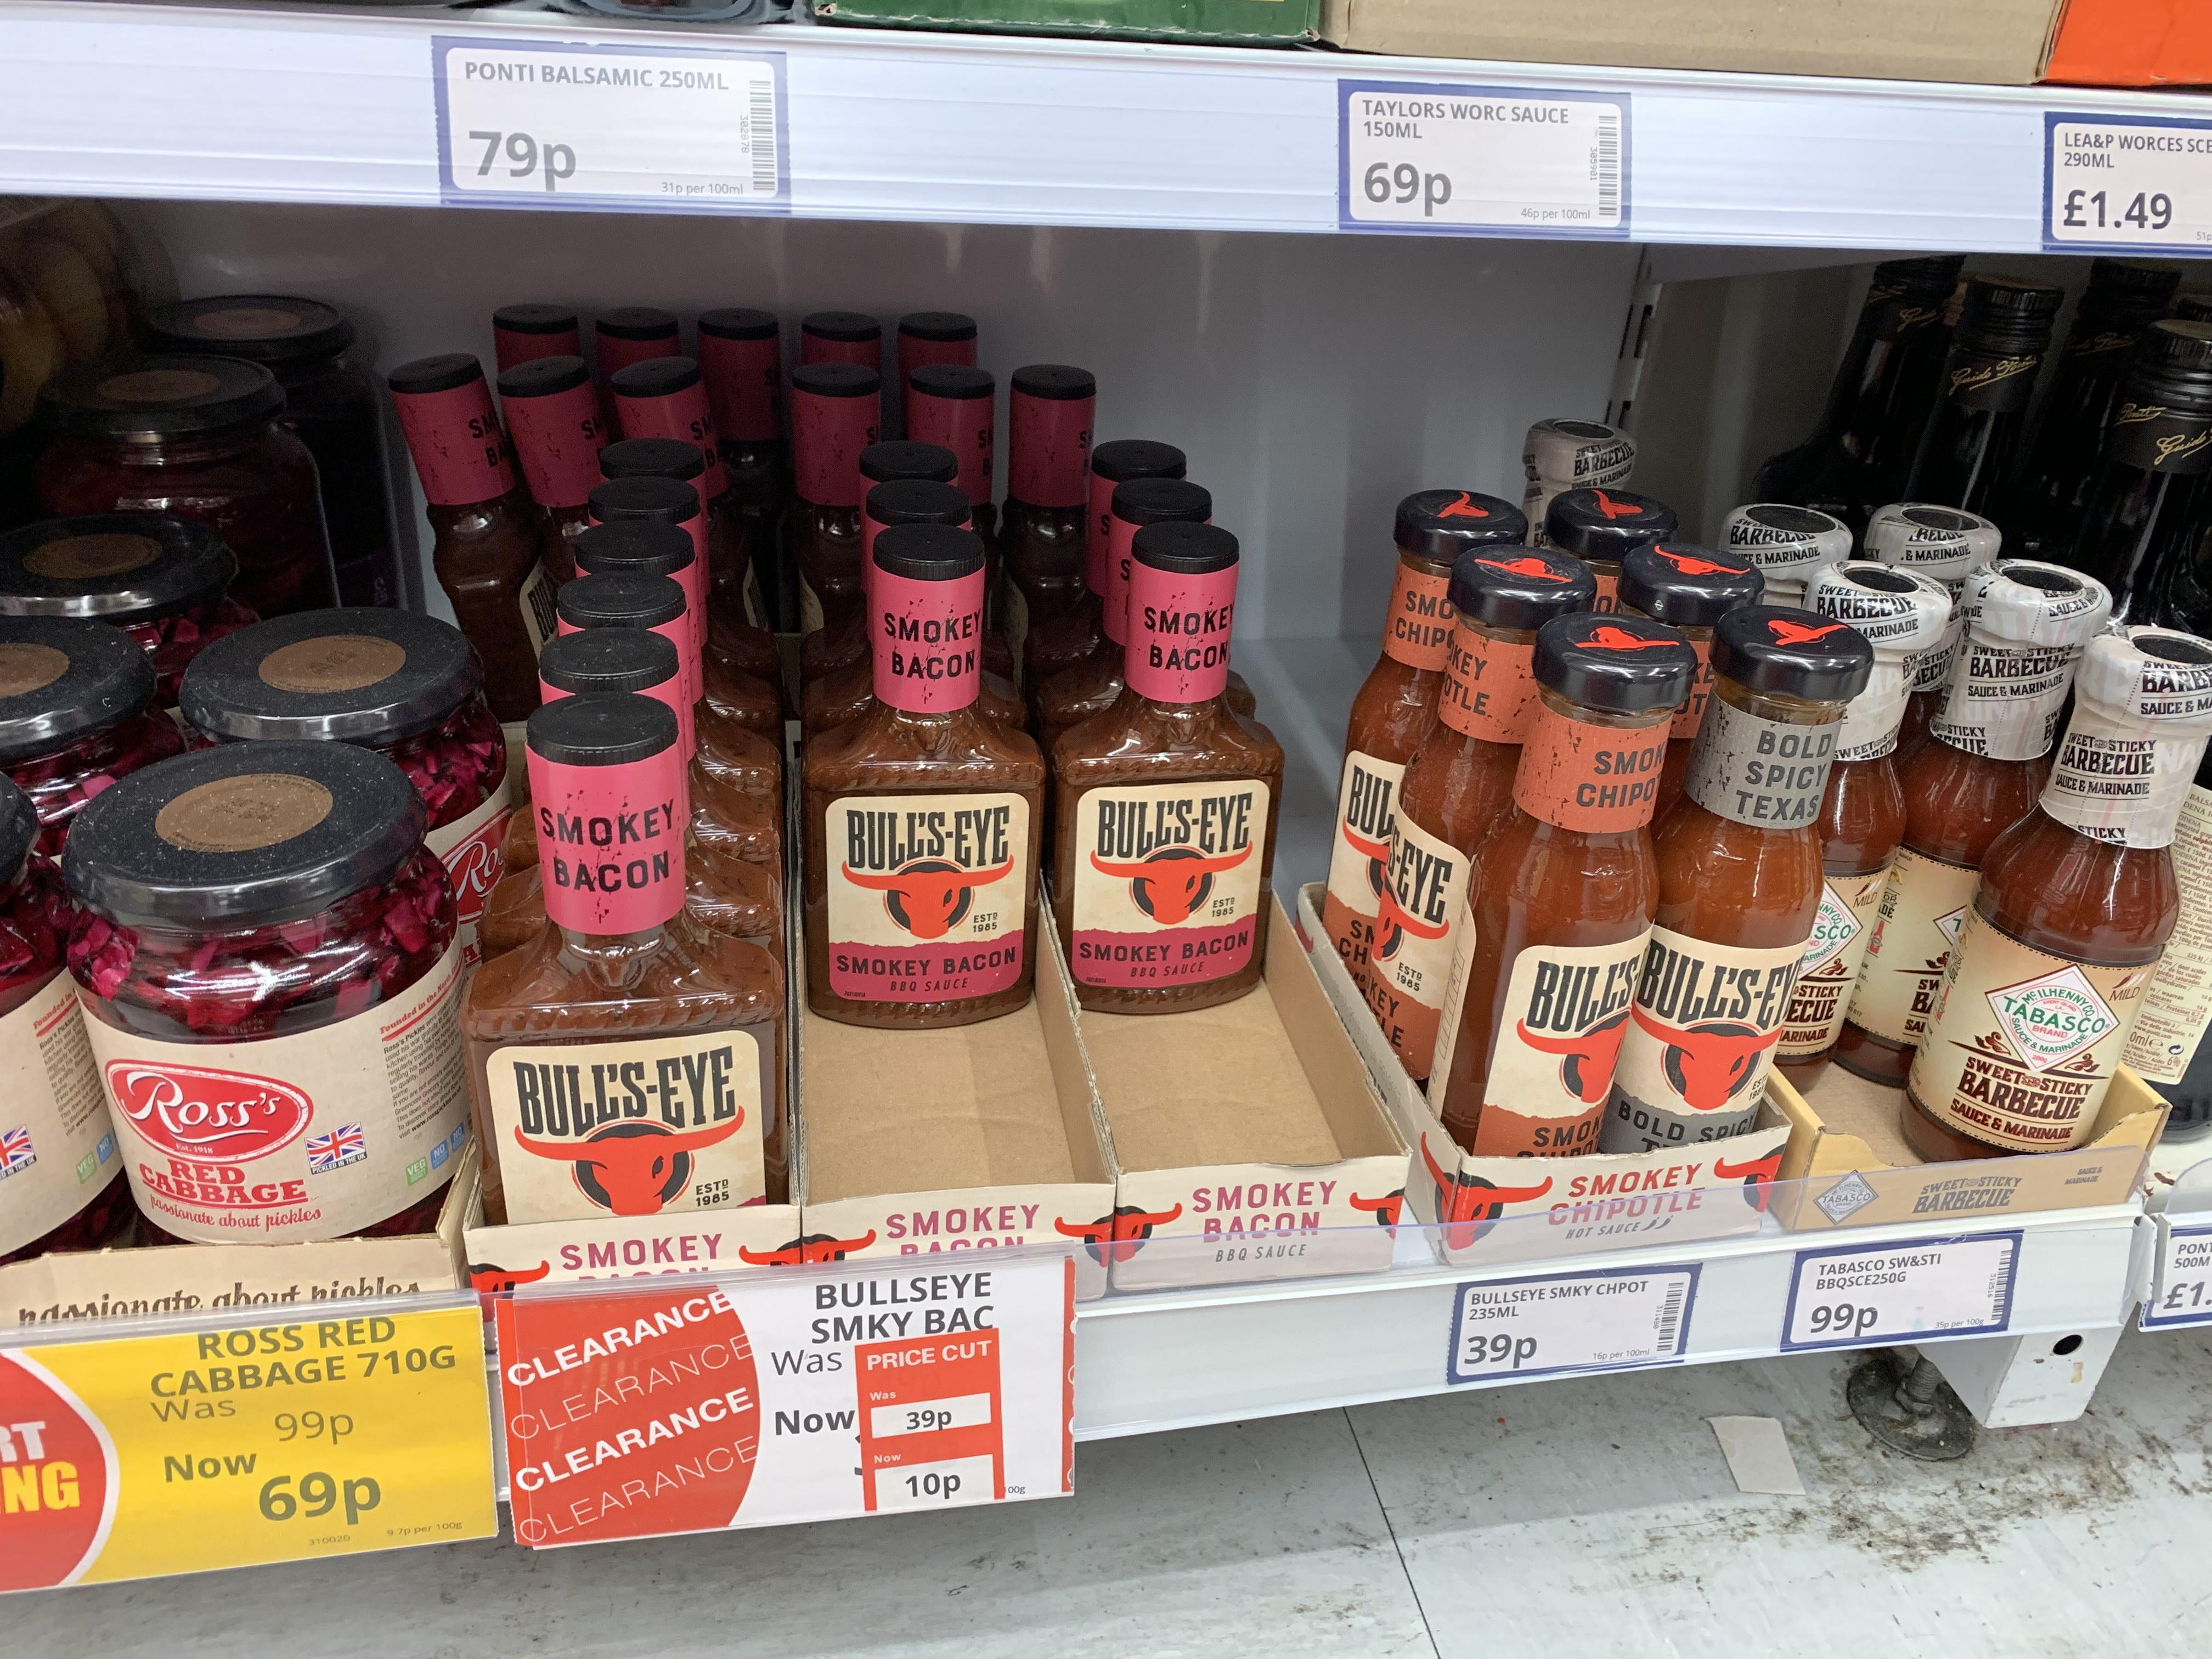 Bullseye BBQ Sauce 'Smokey Bacon' 10p at Poundstretcher Aberdeen